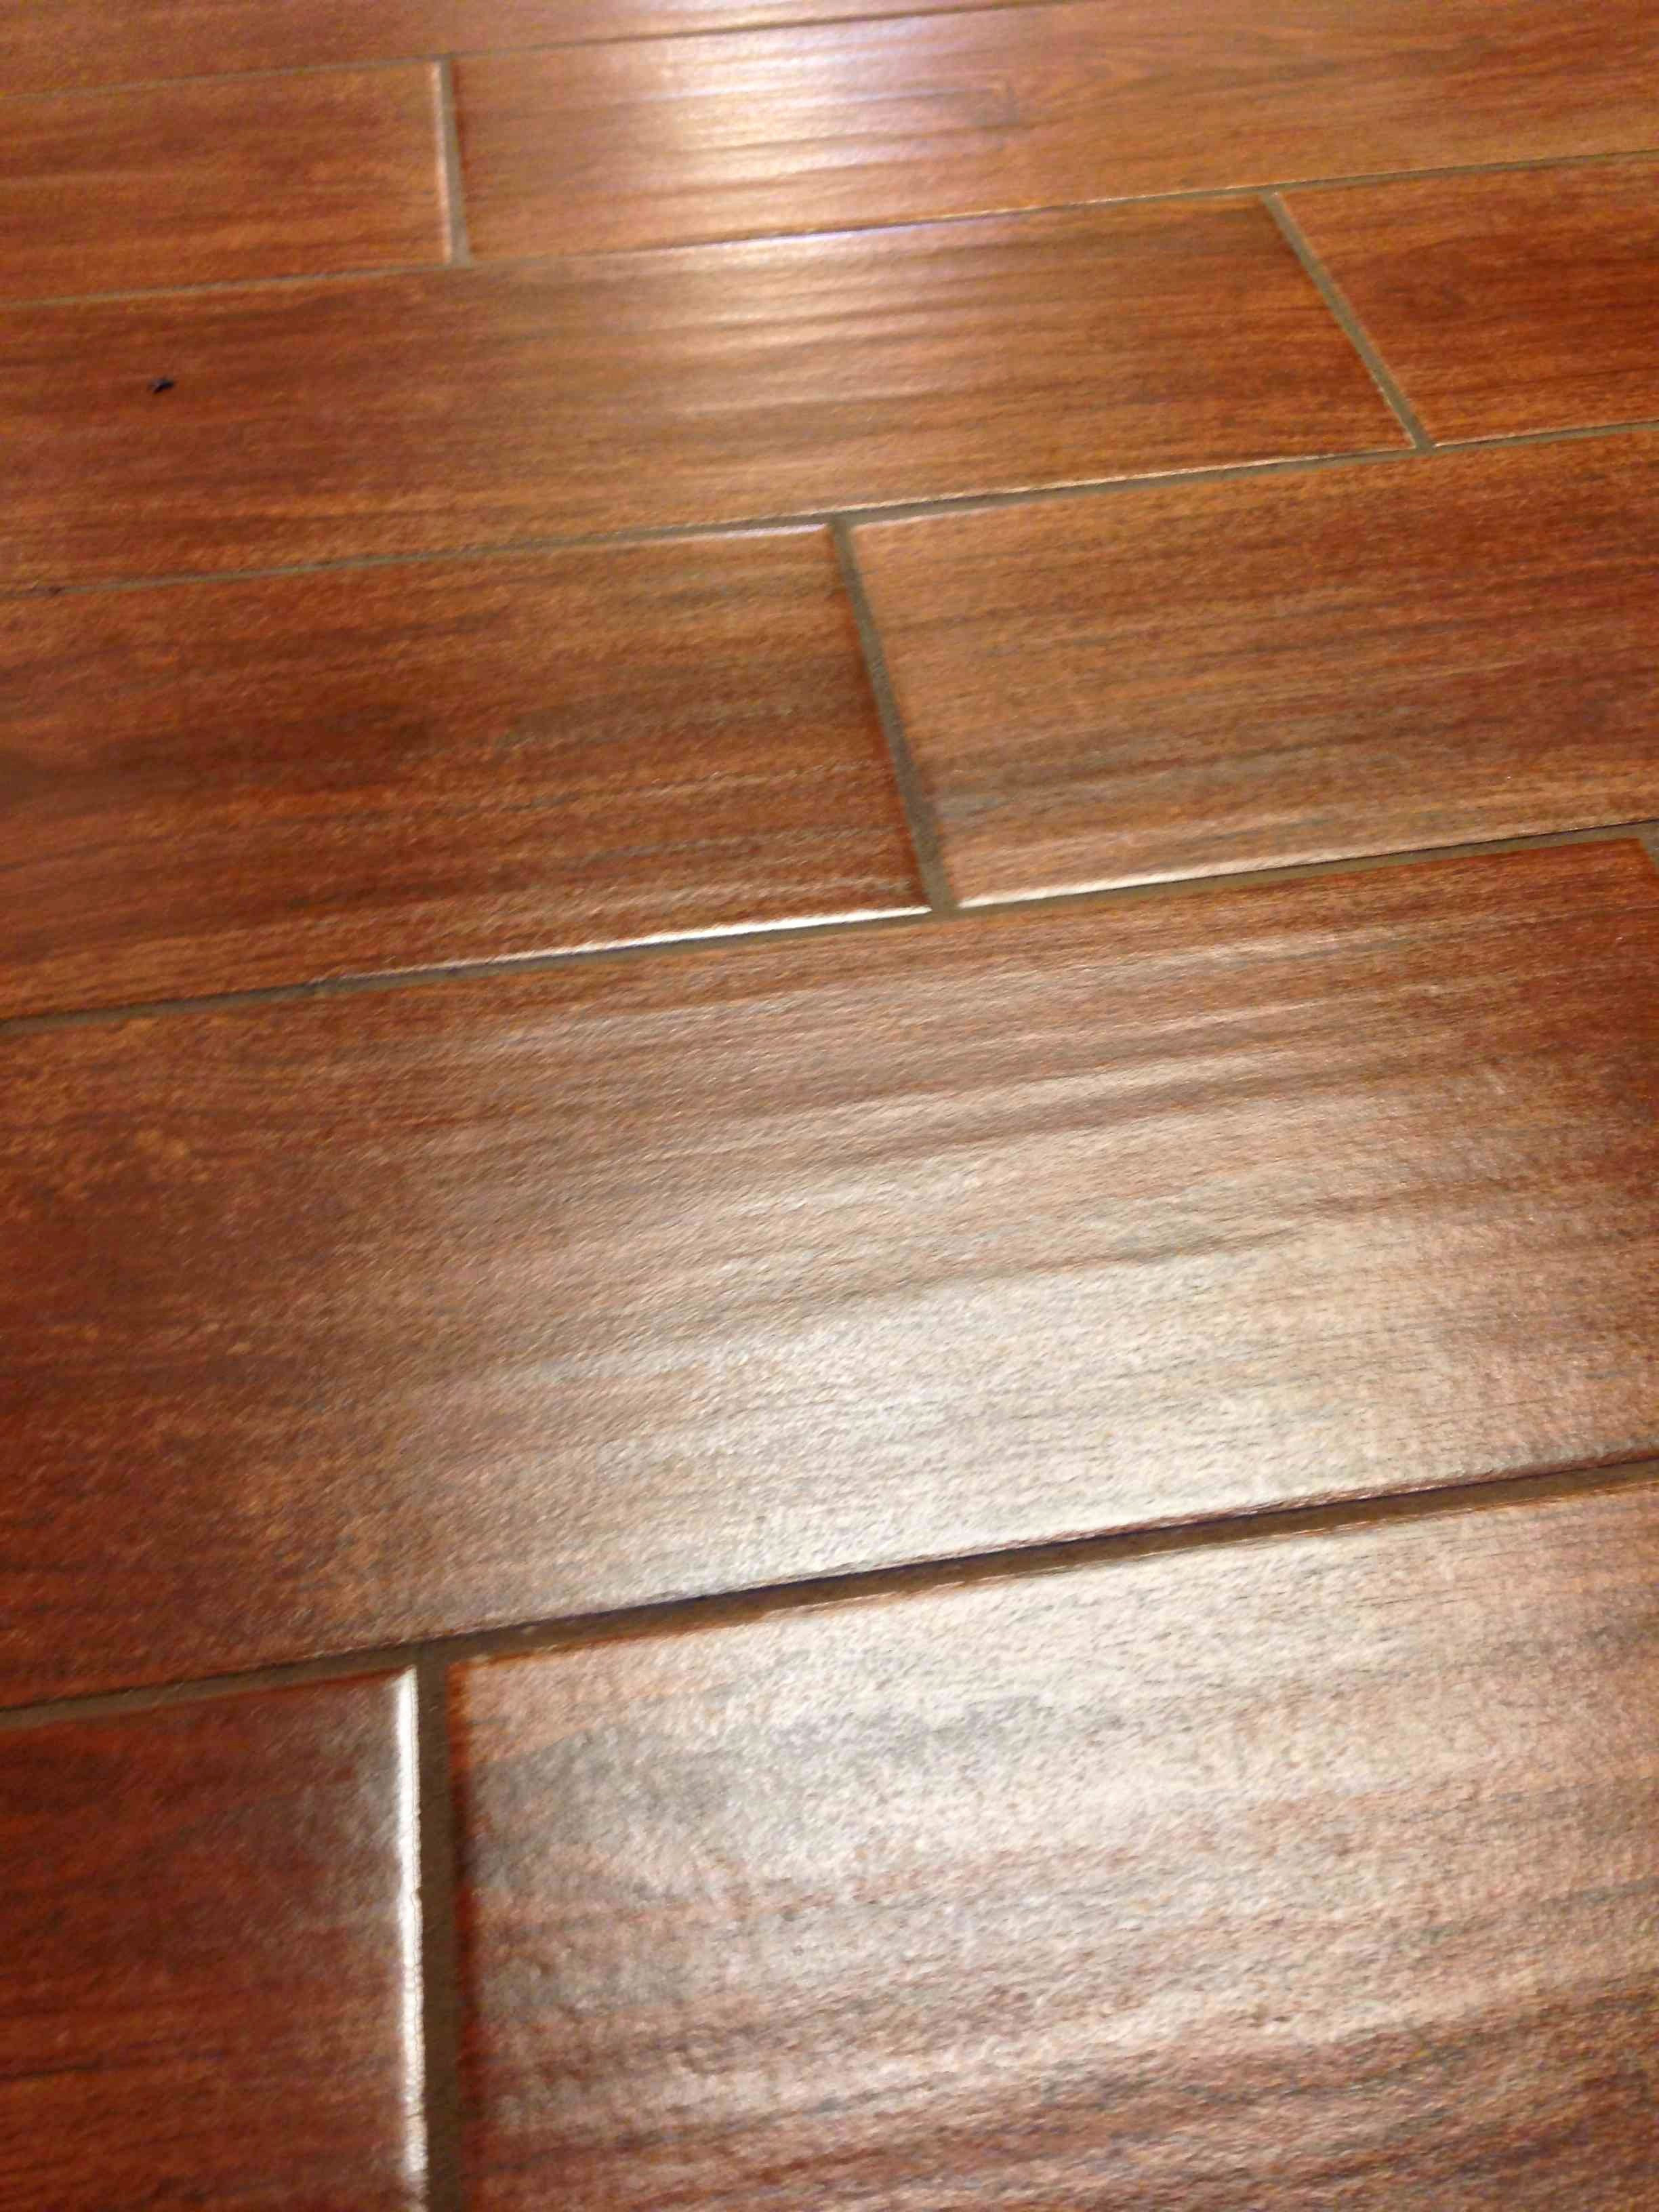 hardwood floor scratch repair of 13 luxury repair hardwood floor collection dizpos com throughout repair hardwood floor unique wood floor store stock of 13 luxury repair hardwood floor collection